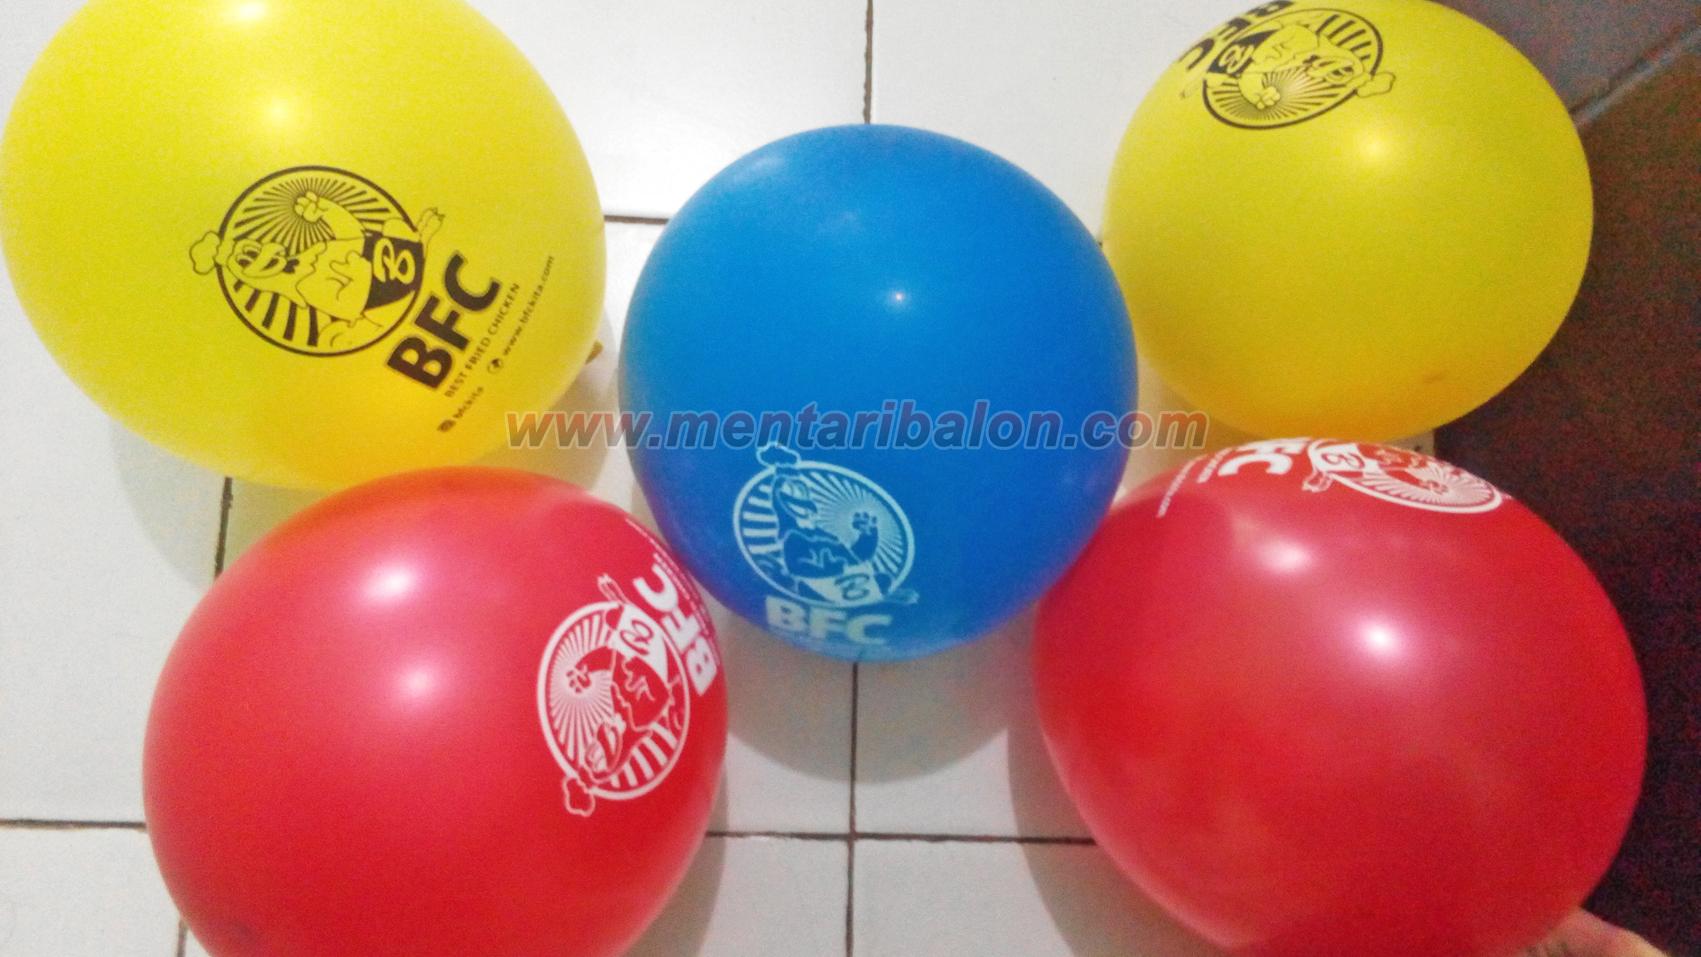 balon sablon bfc